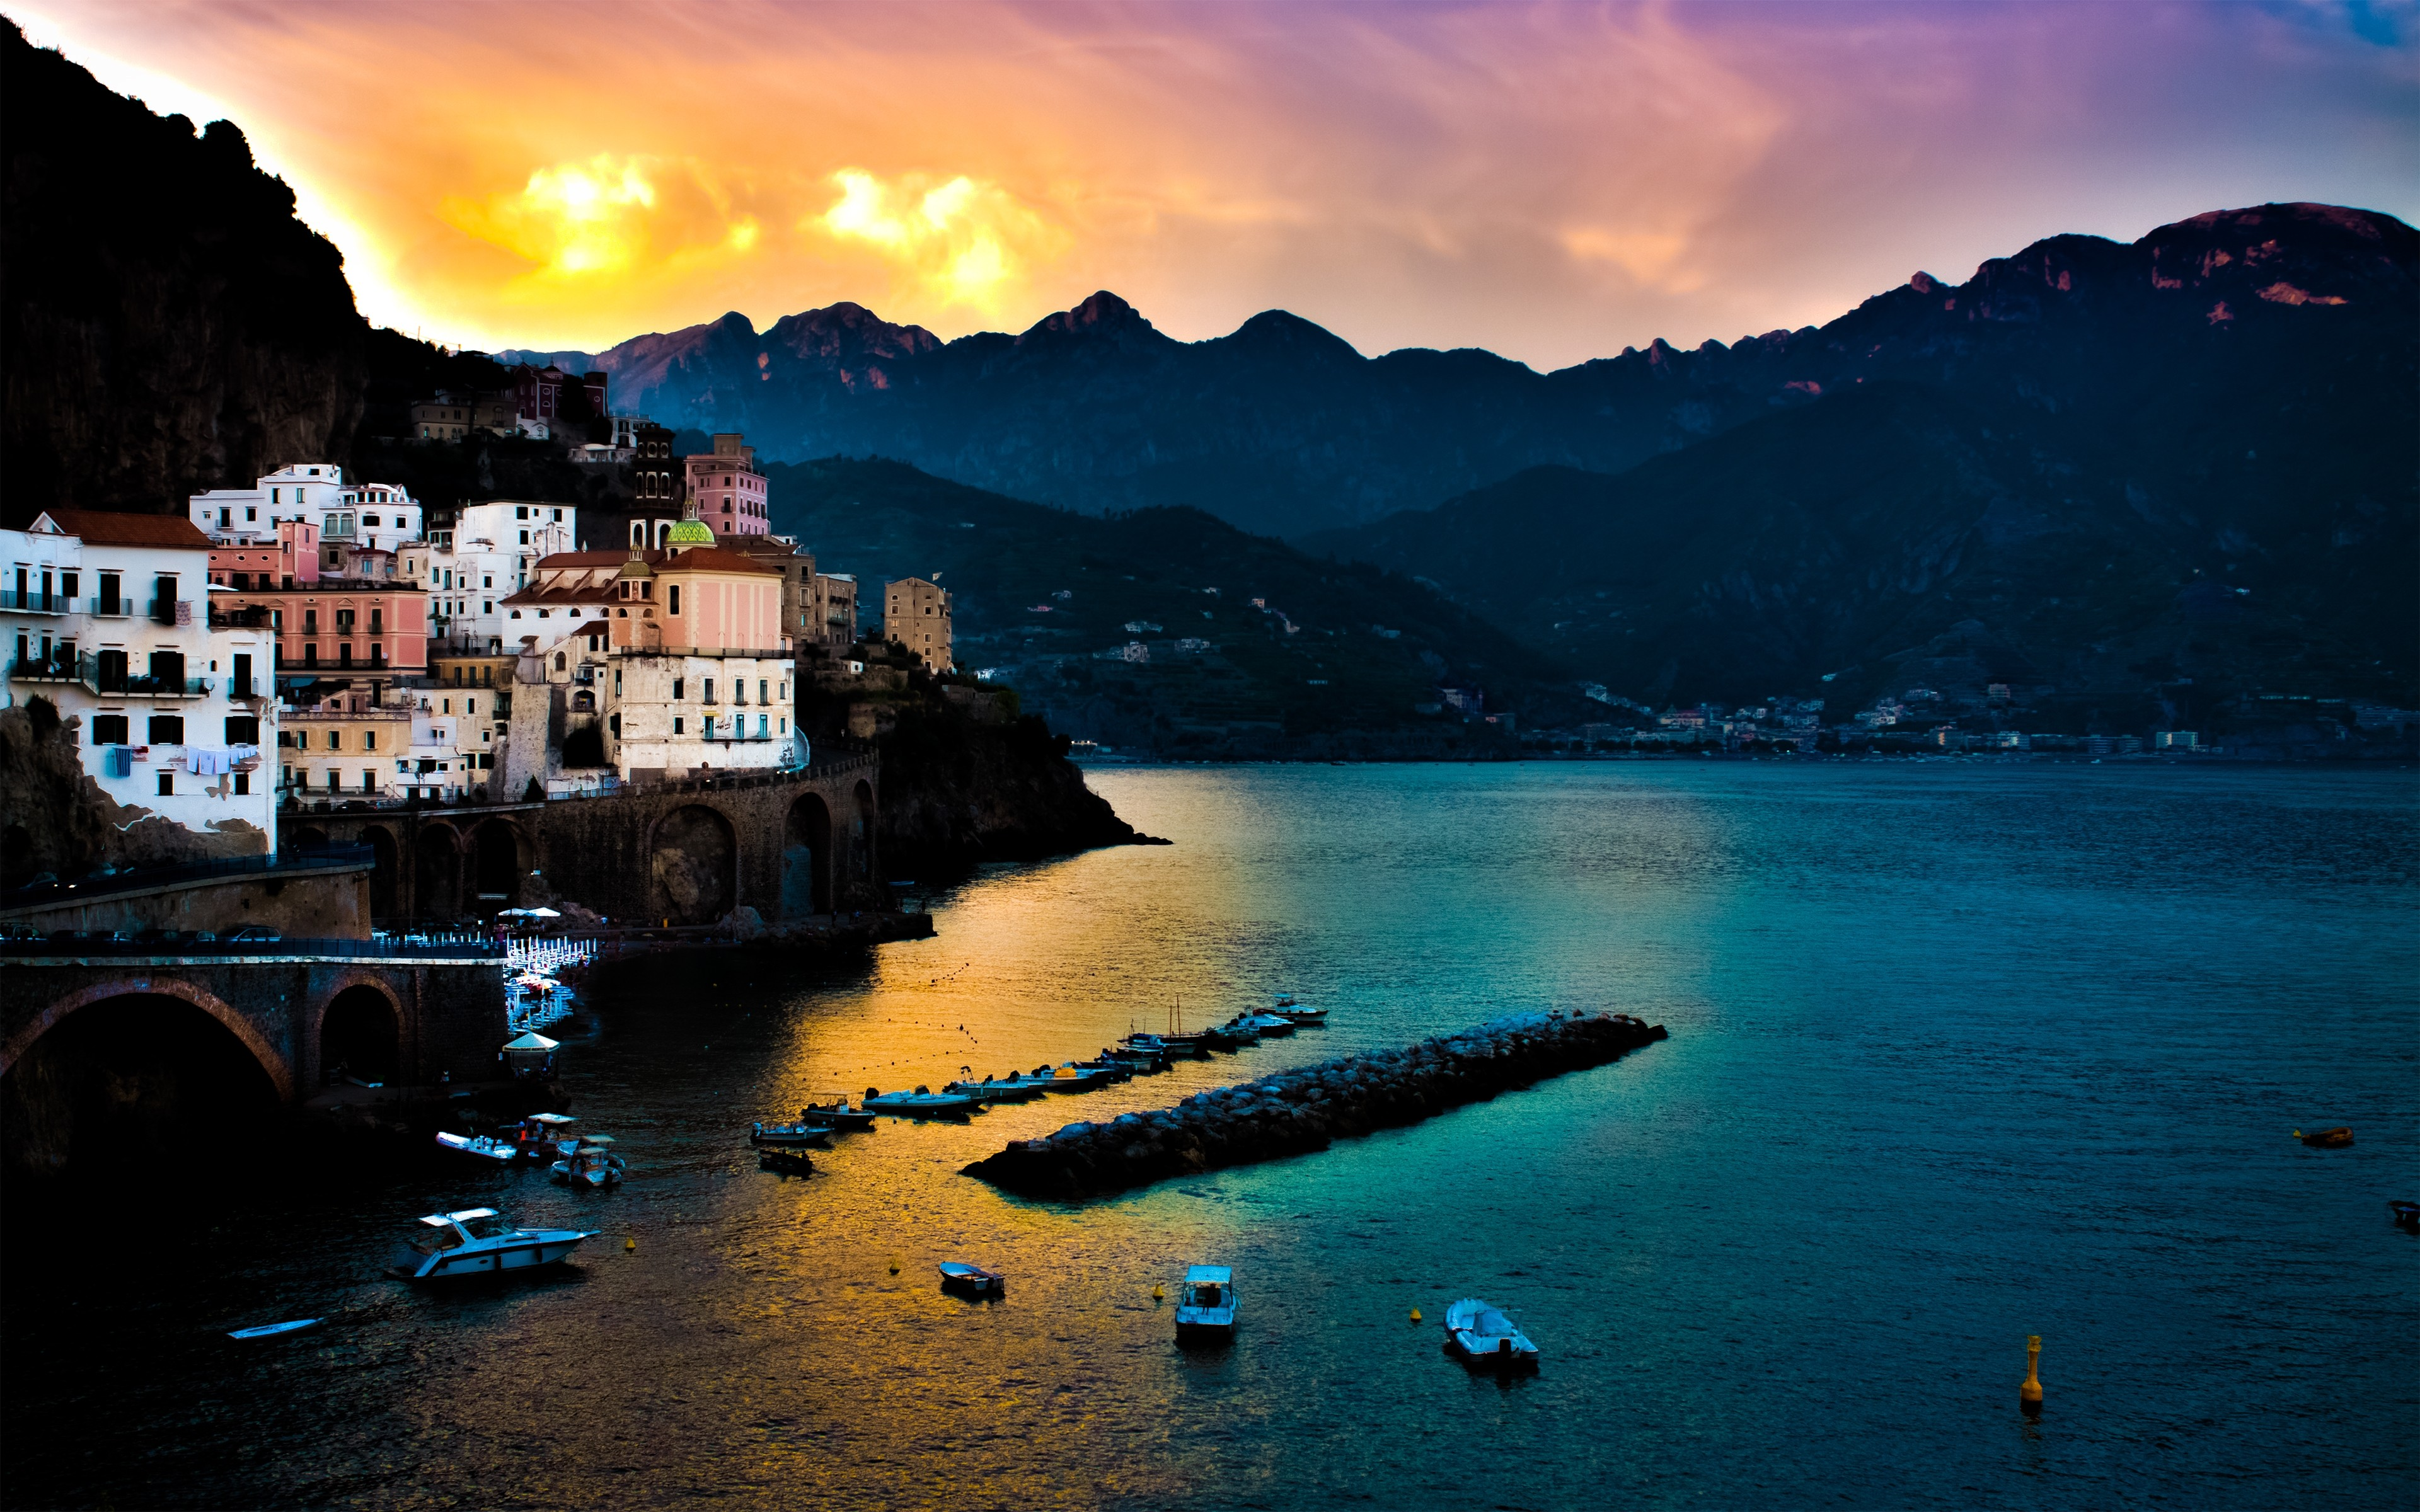 Amalfi 4k ultra hd wallpaper sfondi 3840x2400 id for Sfondi pc 4k